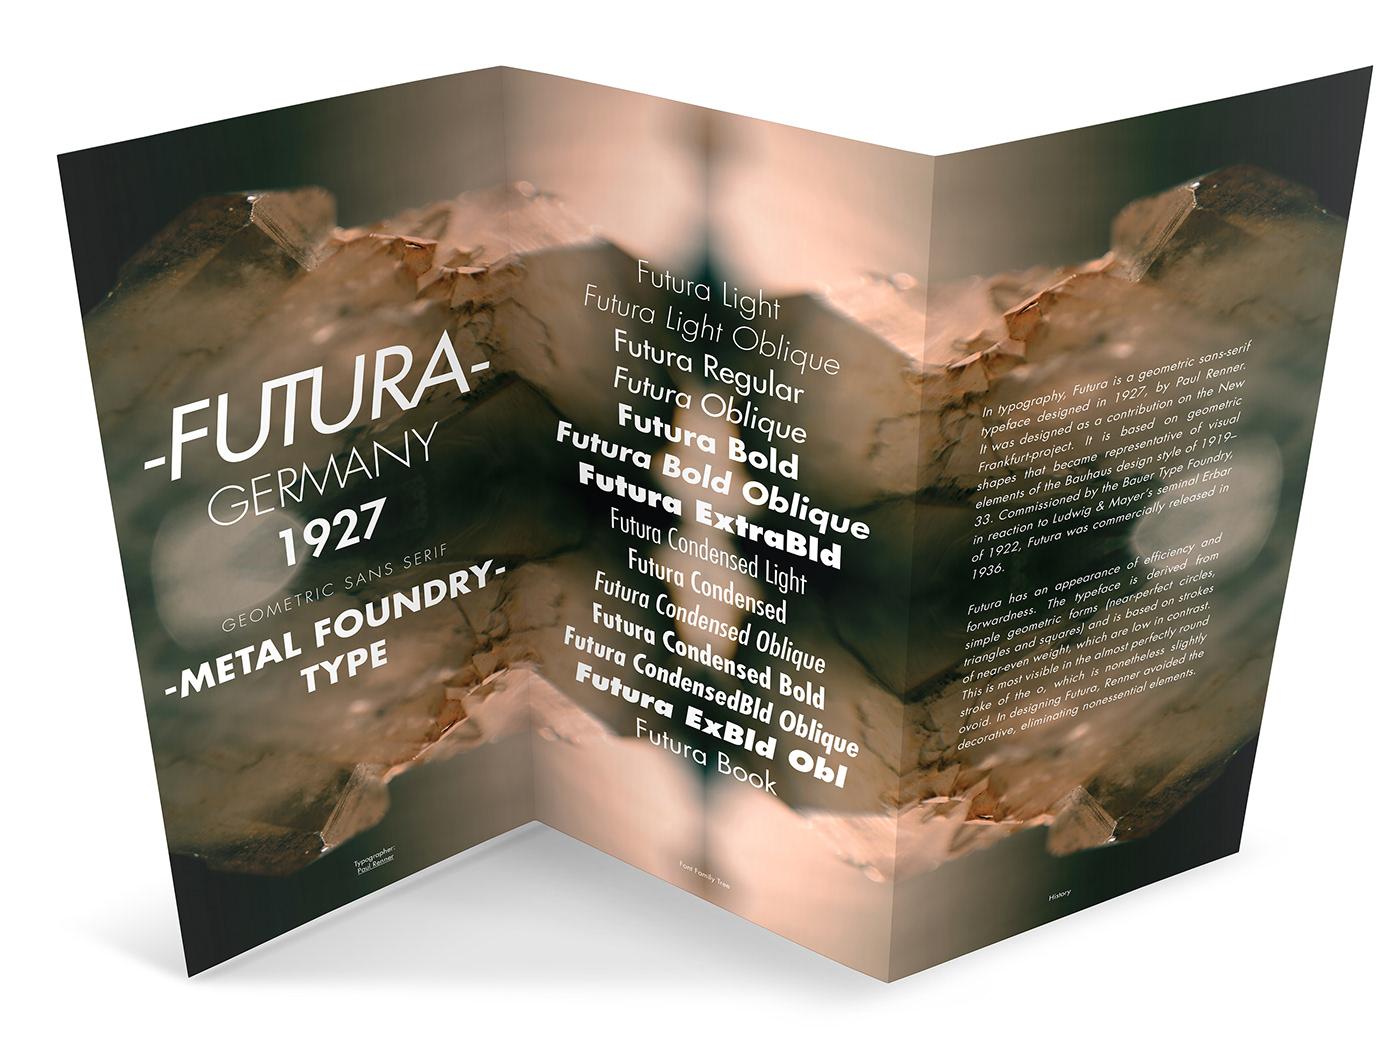 Futura Book Light